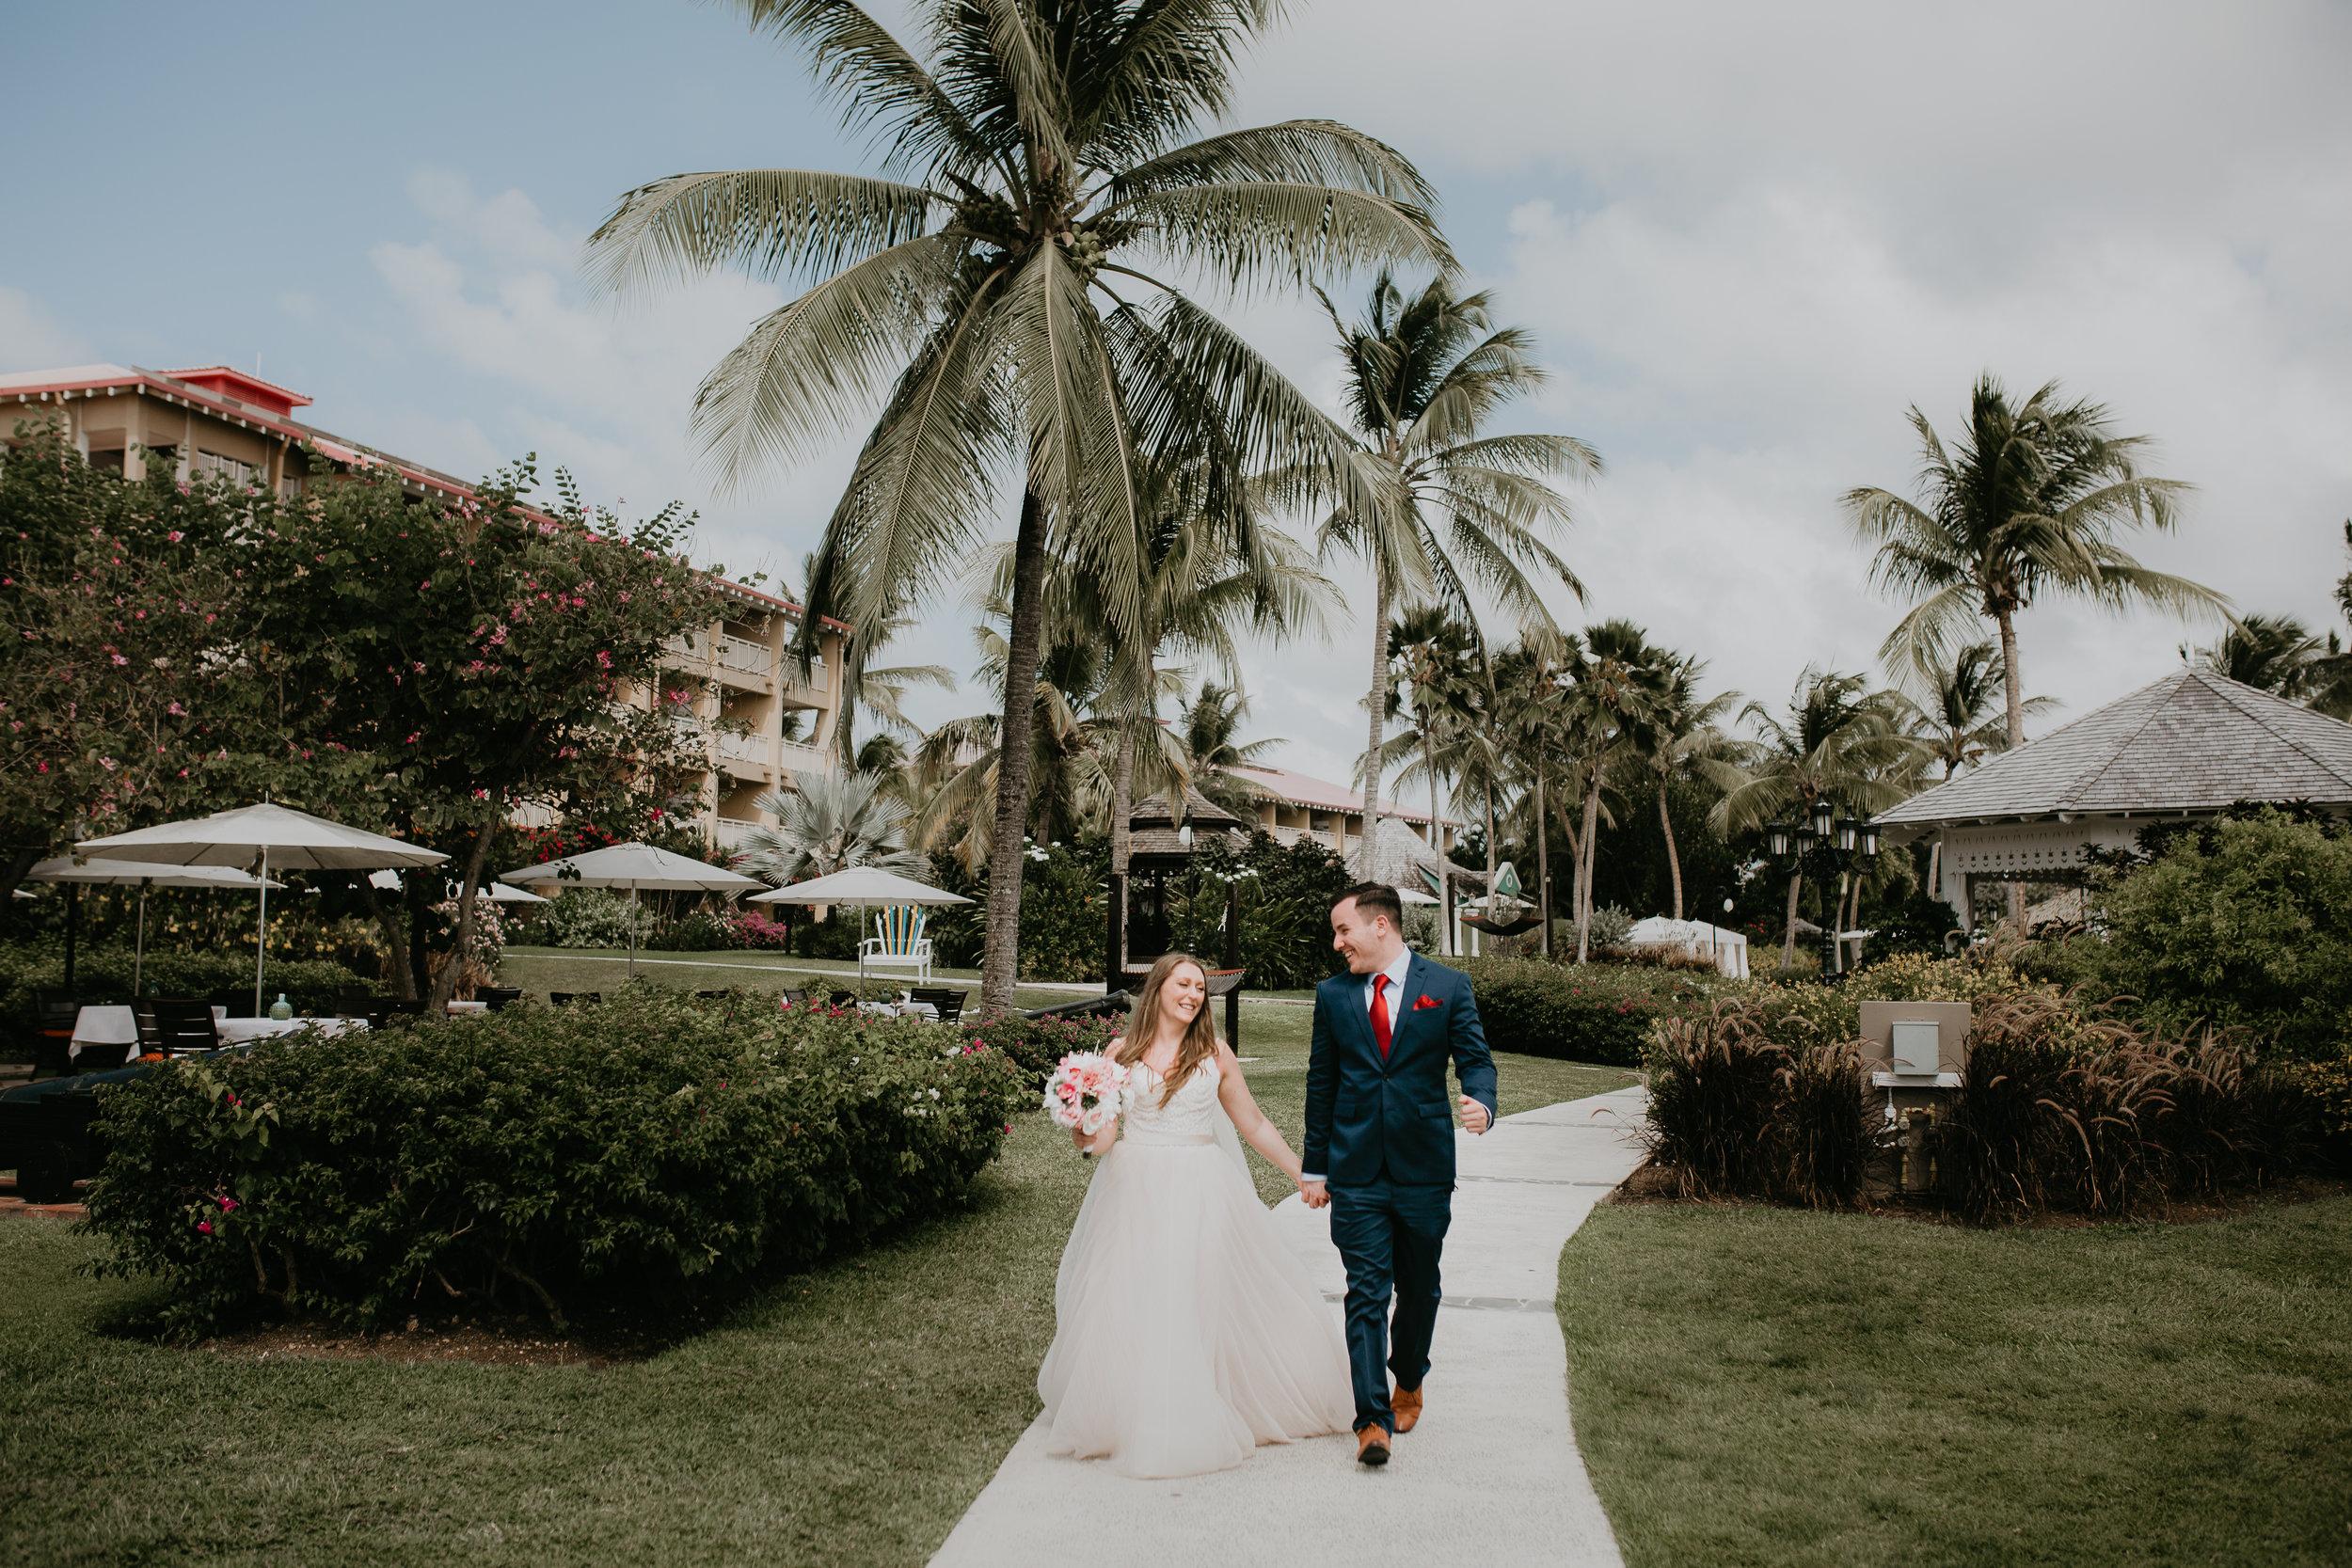 nicole-daacke-photography-destination-wedding-in-st-lucia-sandals-la-toc-intimate-island-wedding-carribean-elopement-photographer-chill-island-wedding-40.jpg